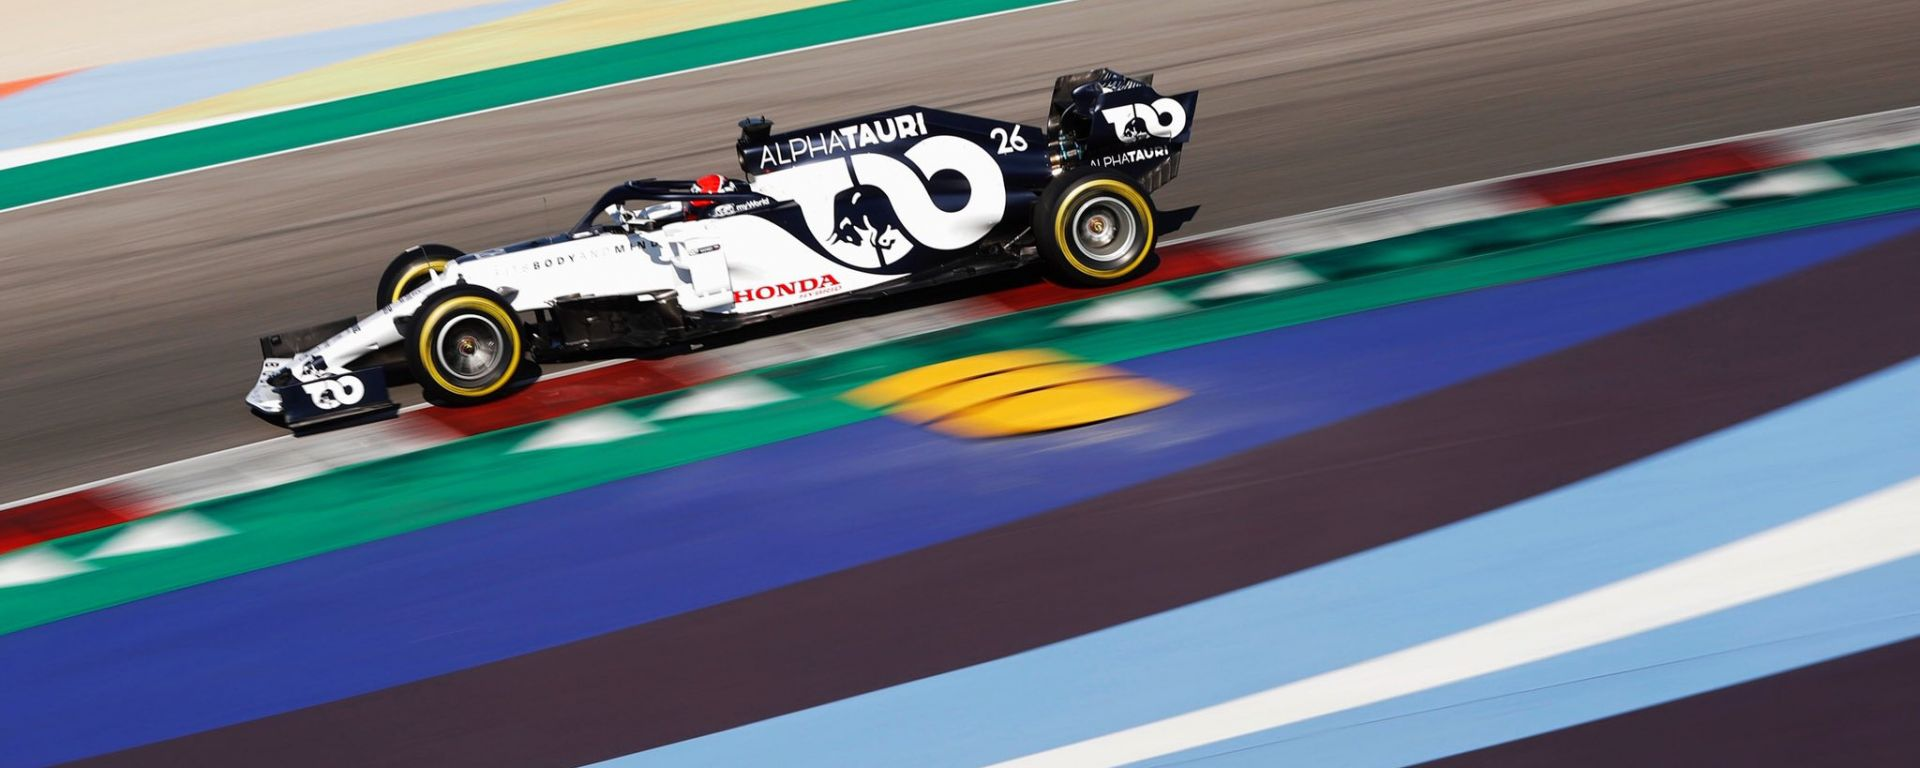 F1 2020: Daniil Kvyat (Alpha Tauri) impegnato a Misano